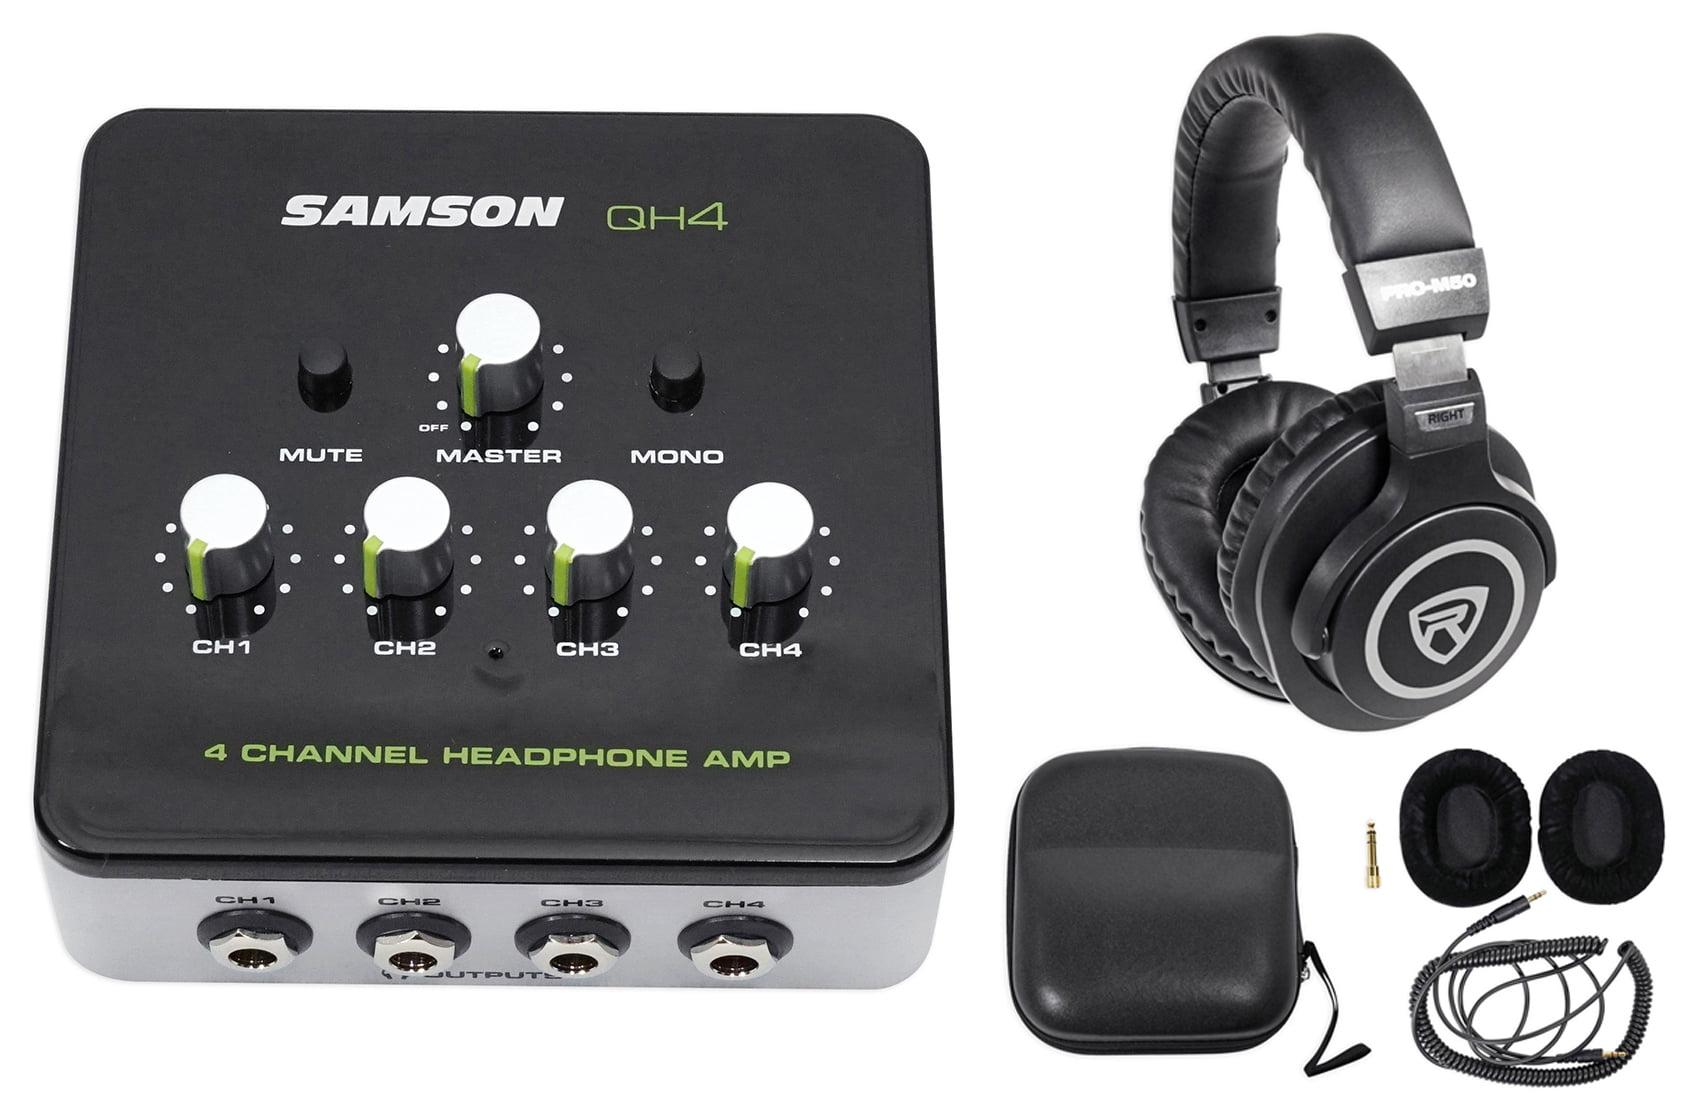 SAMSON QH4 4-Ch Stereo DJ Monitoring Headphone Amplifier Amp+Studio Headphones by Samson